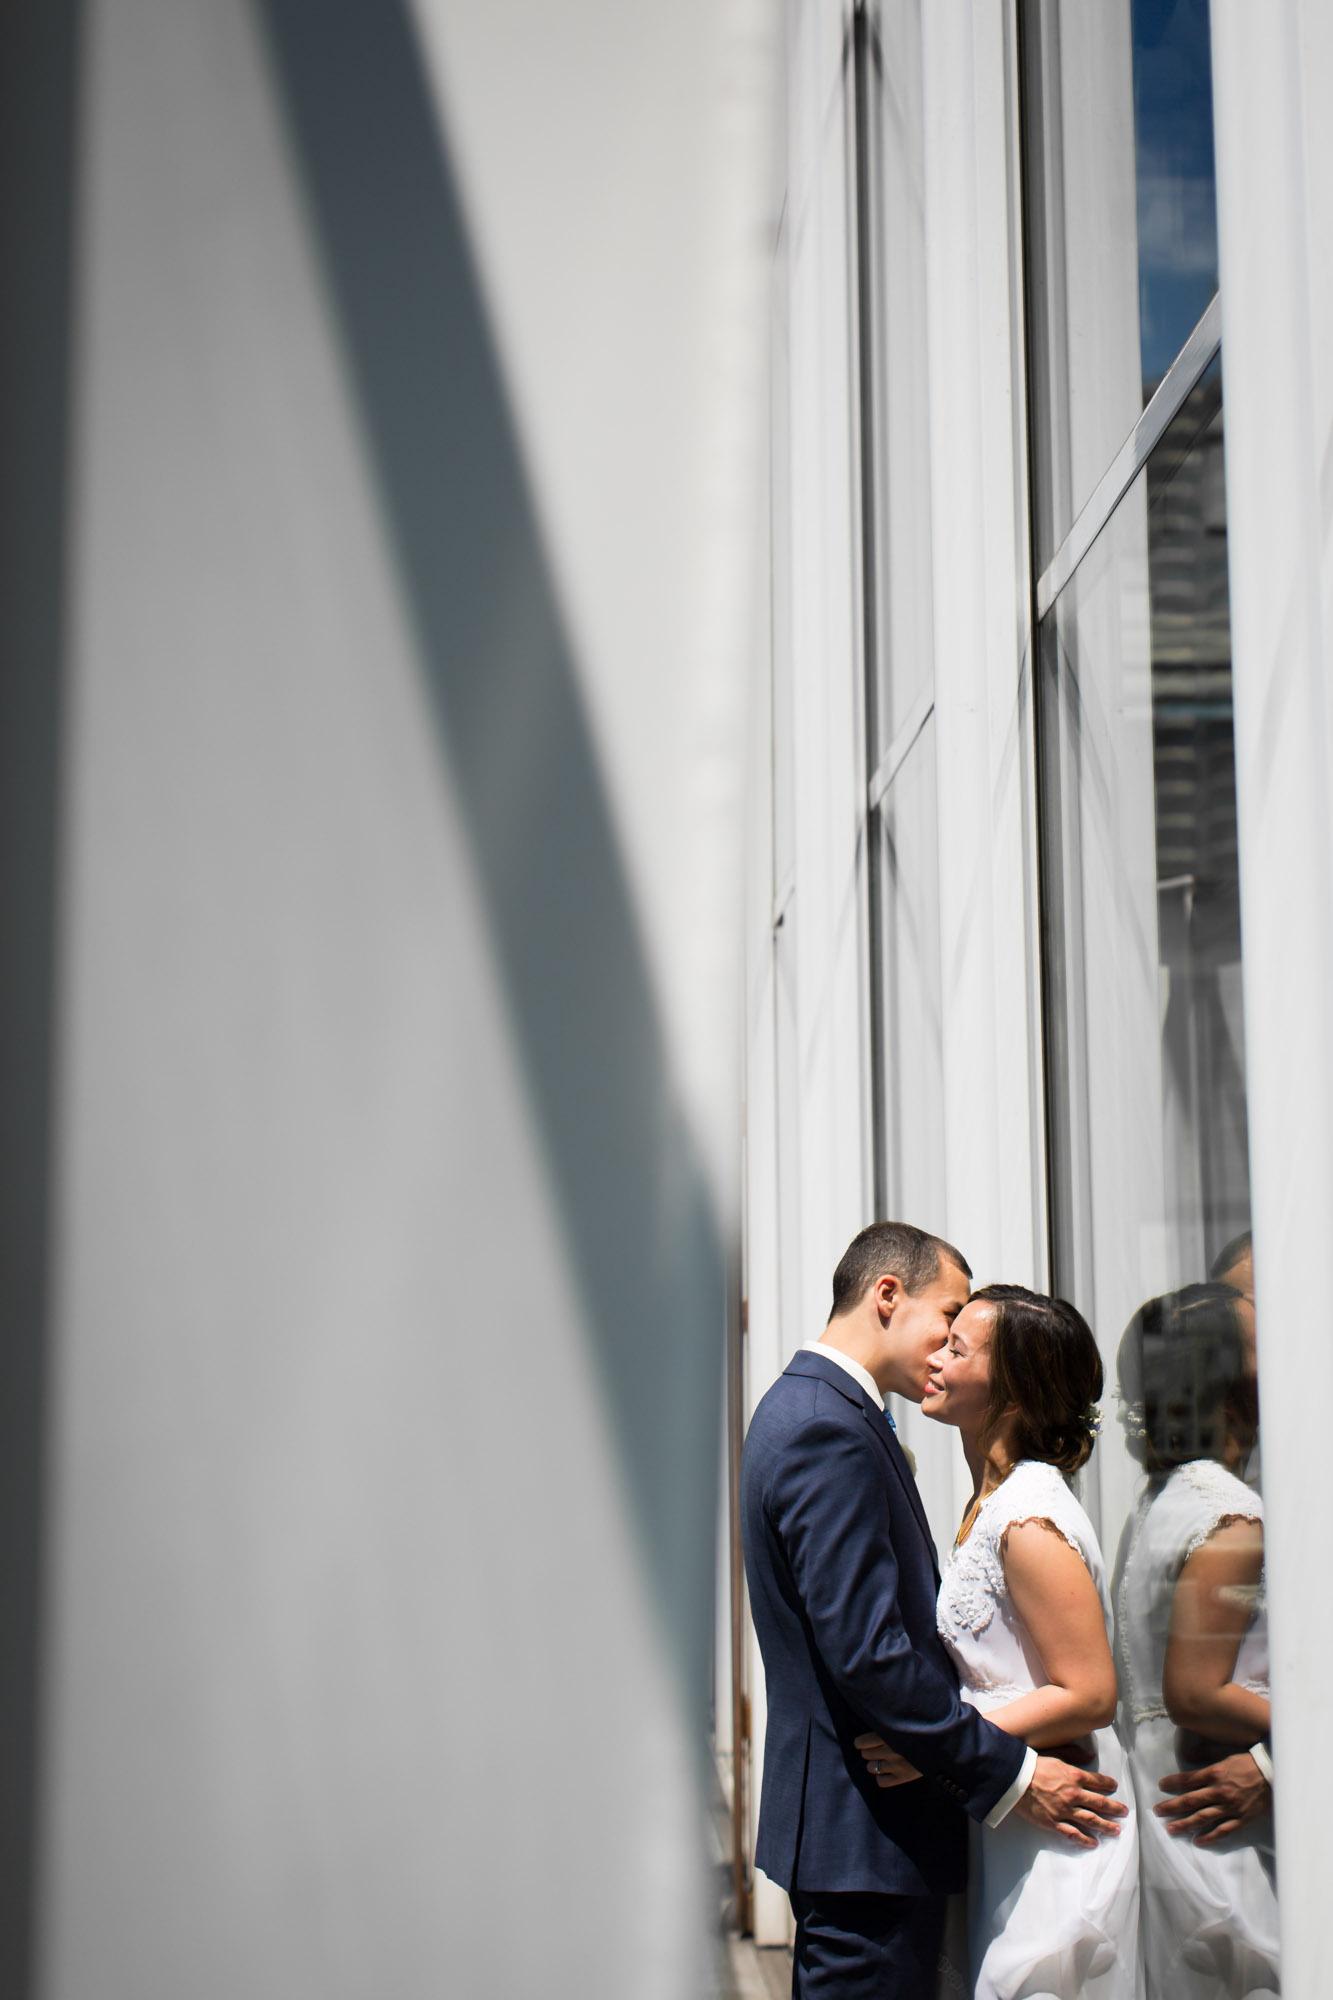 lam-chicago-wedding-photos-22.jpg